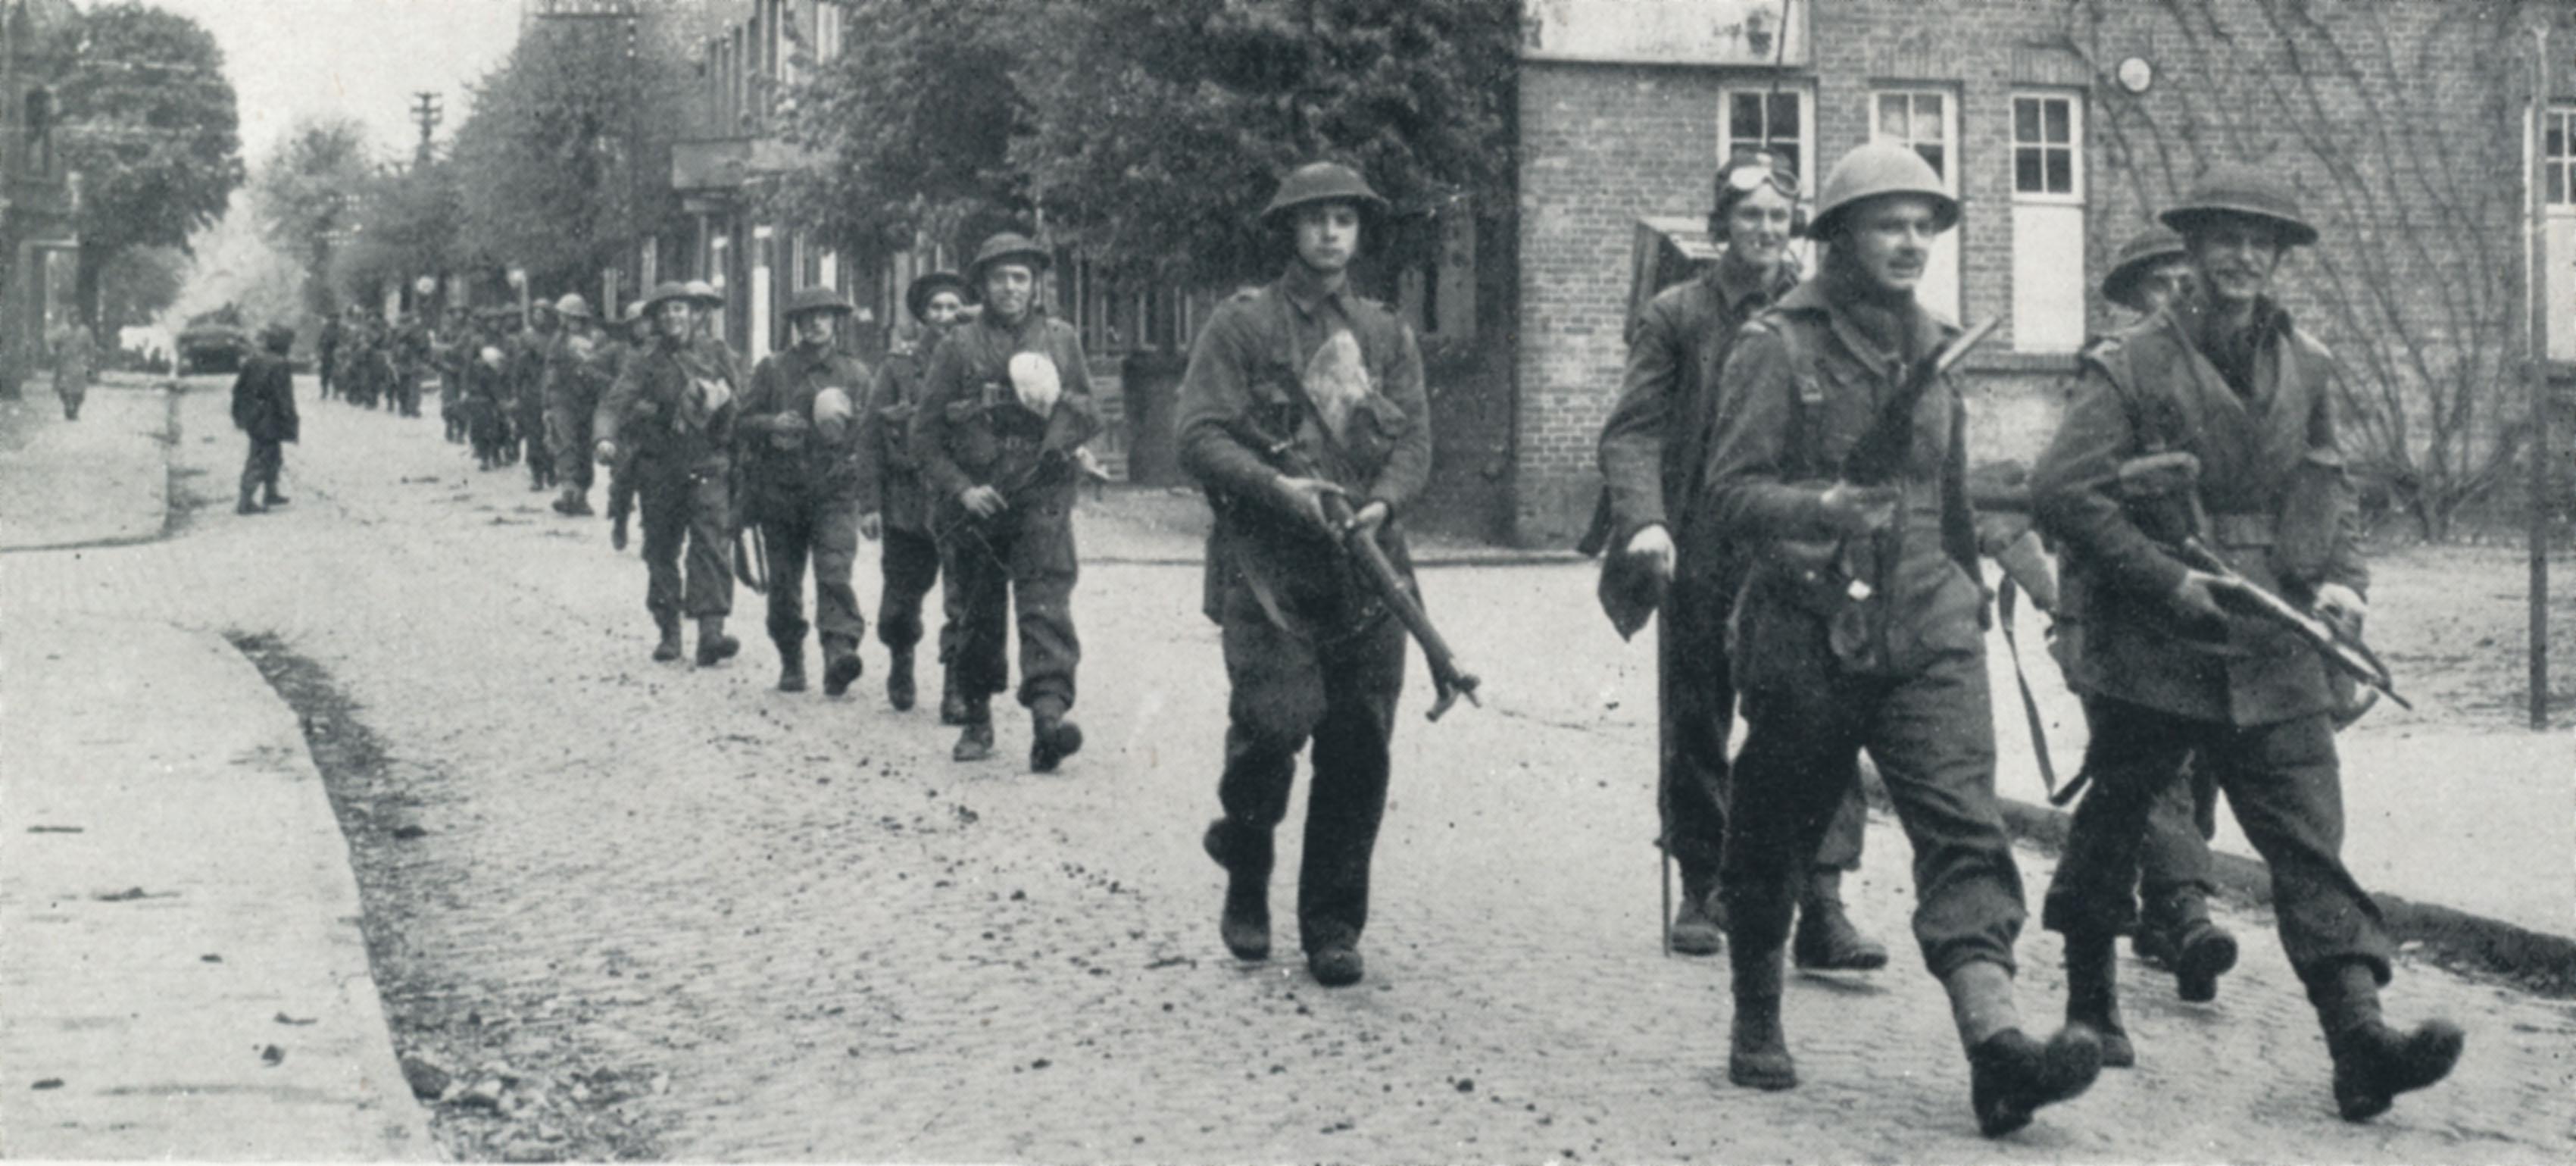 British_2nd_Army_soldiers_advance_Zeven.jpg